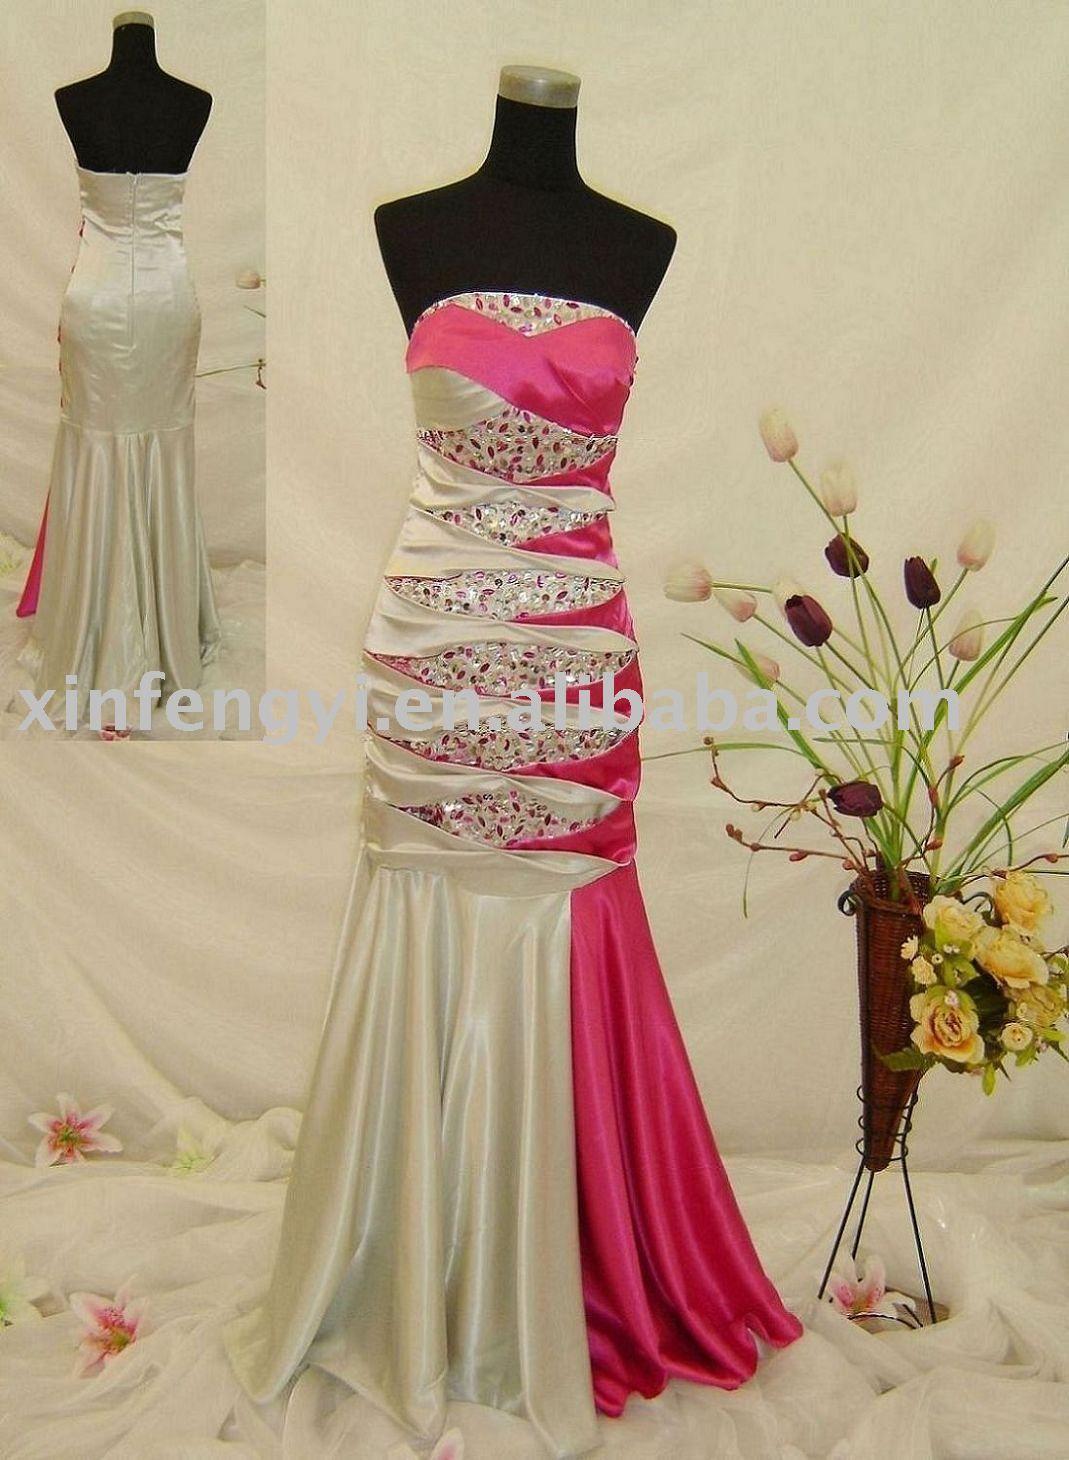 Designer Dresses For Less   Trends For Fall   Fashion ...